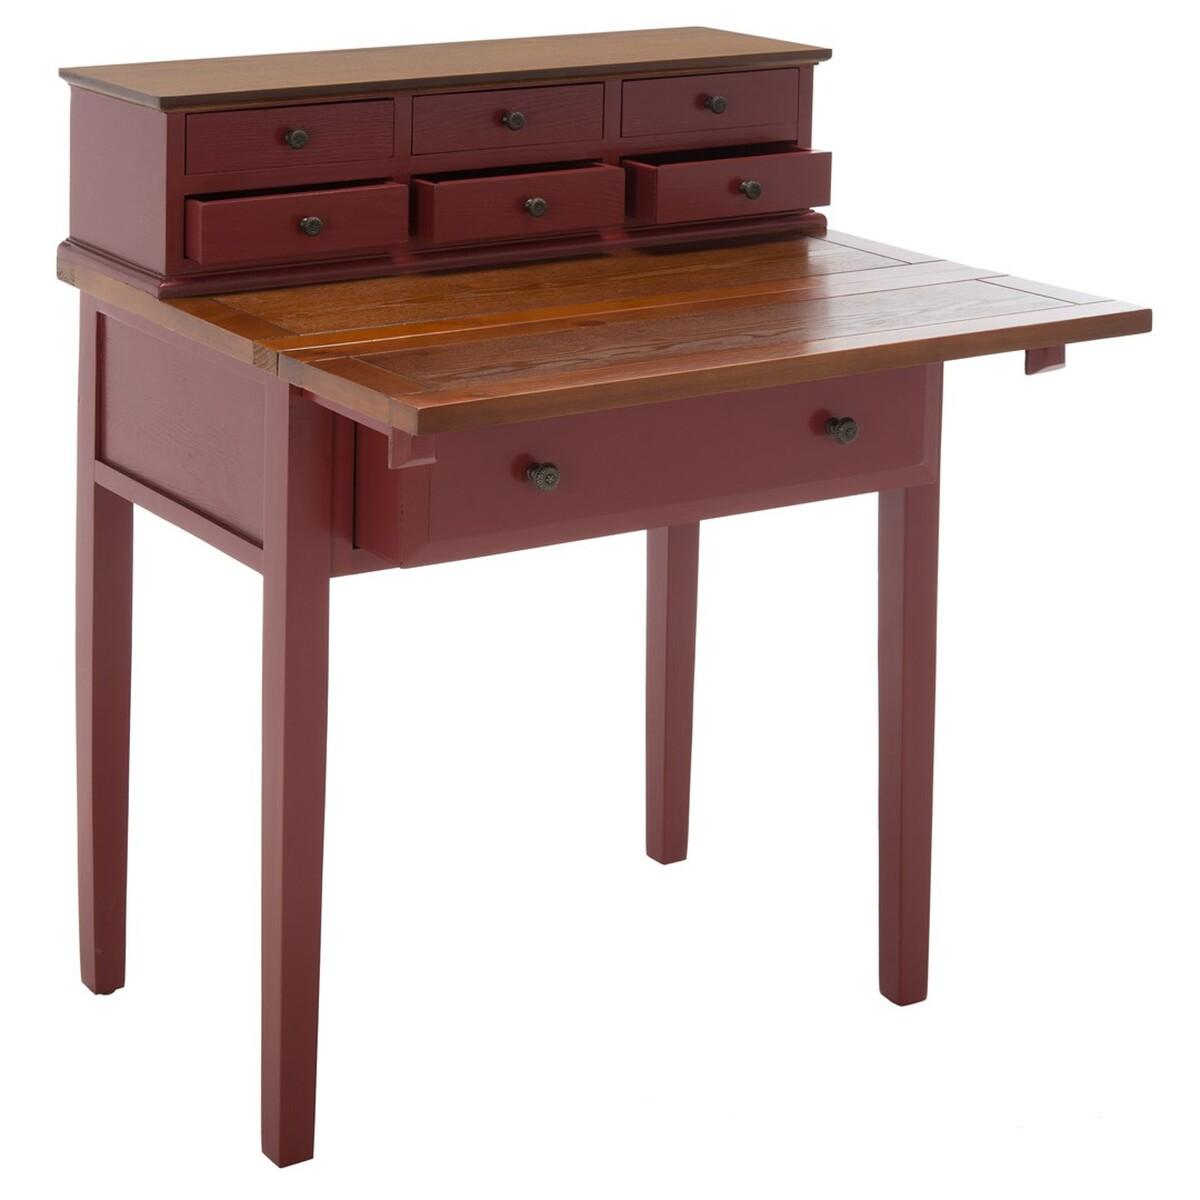 office chair qvc handicap shower chairs swivel amh6520a desks furniture by safavieh